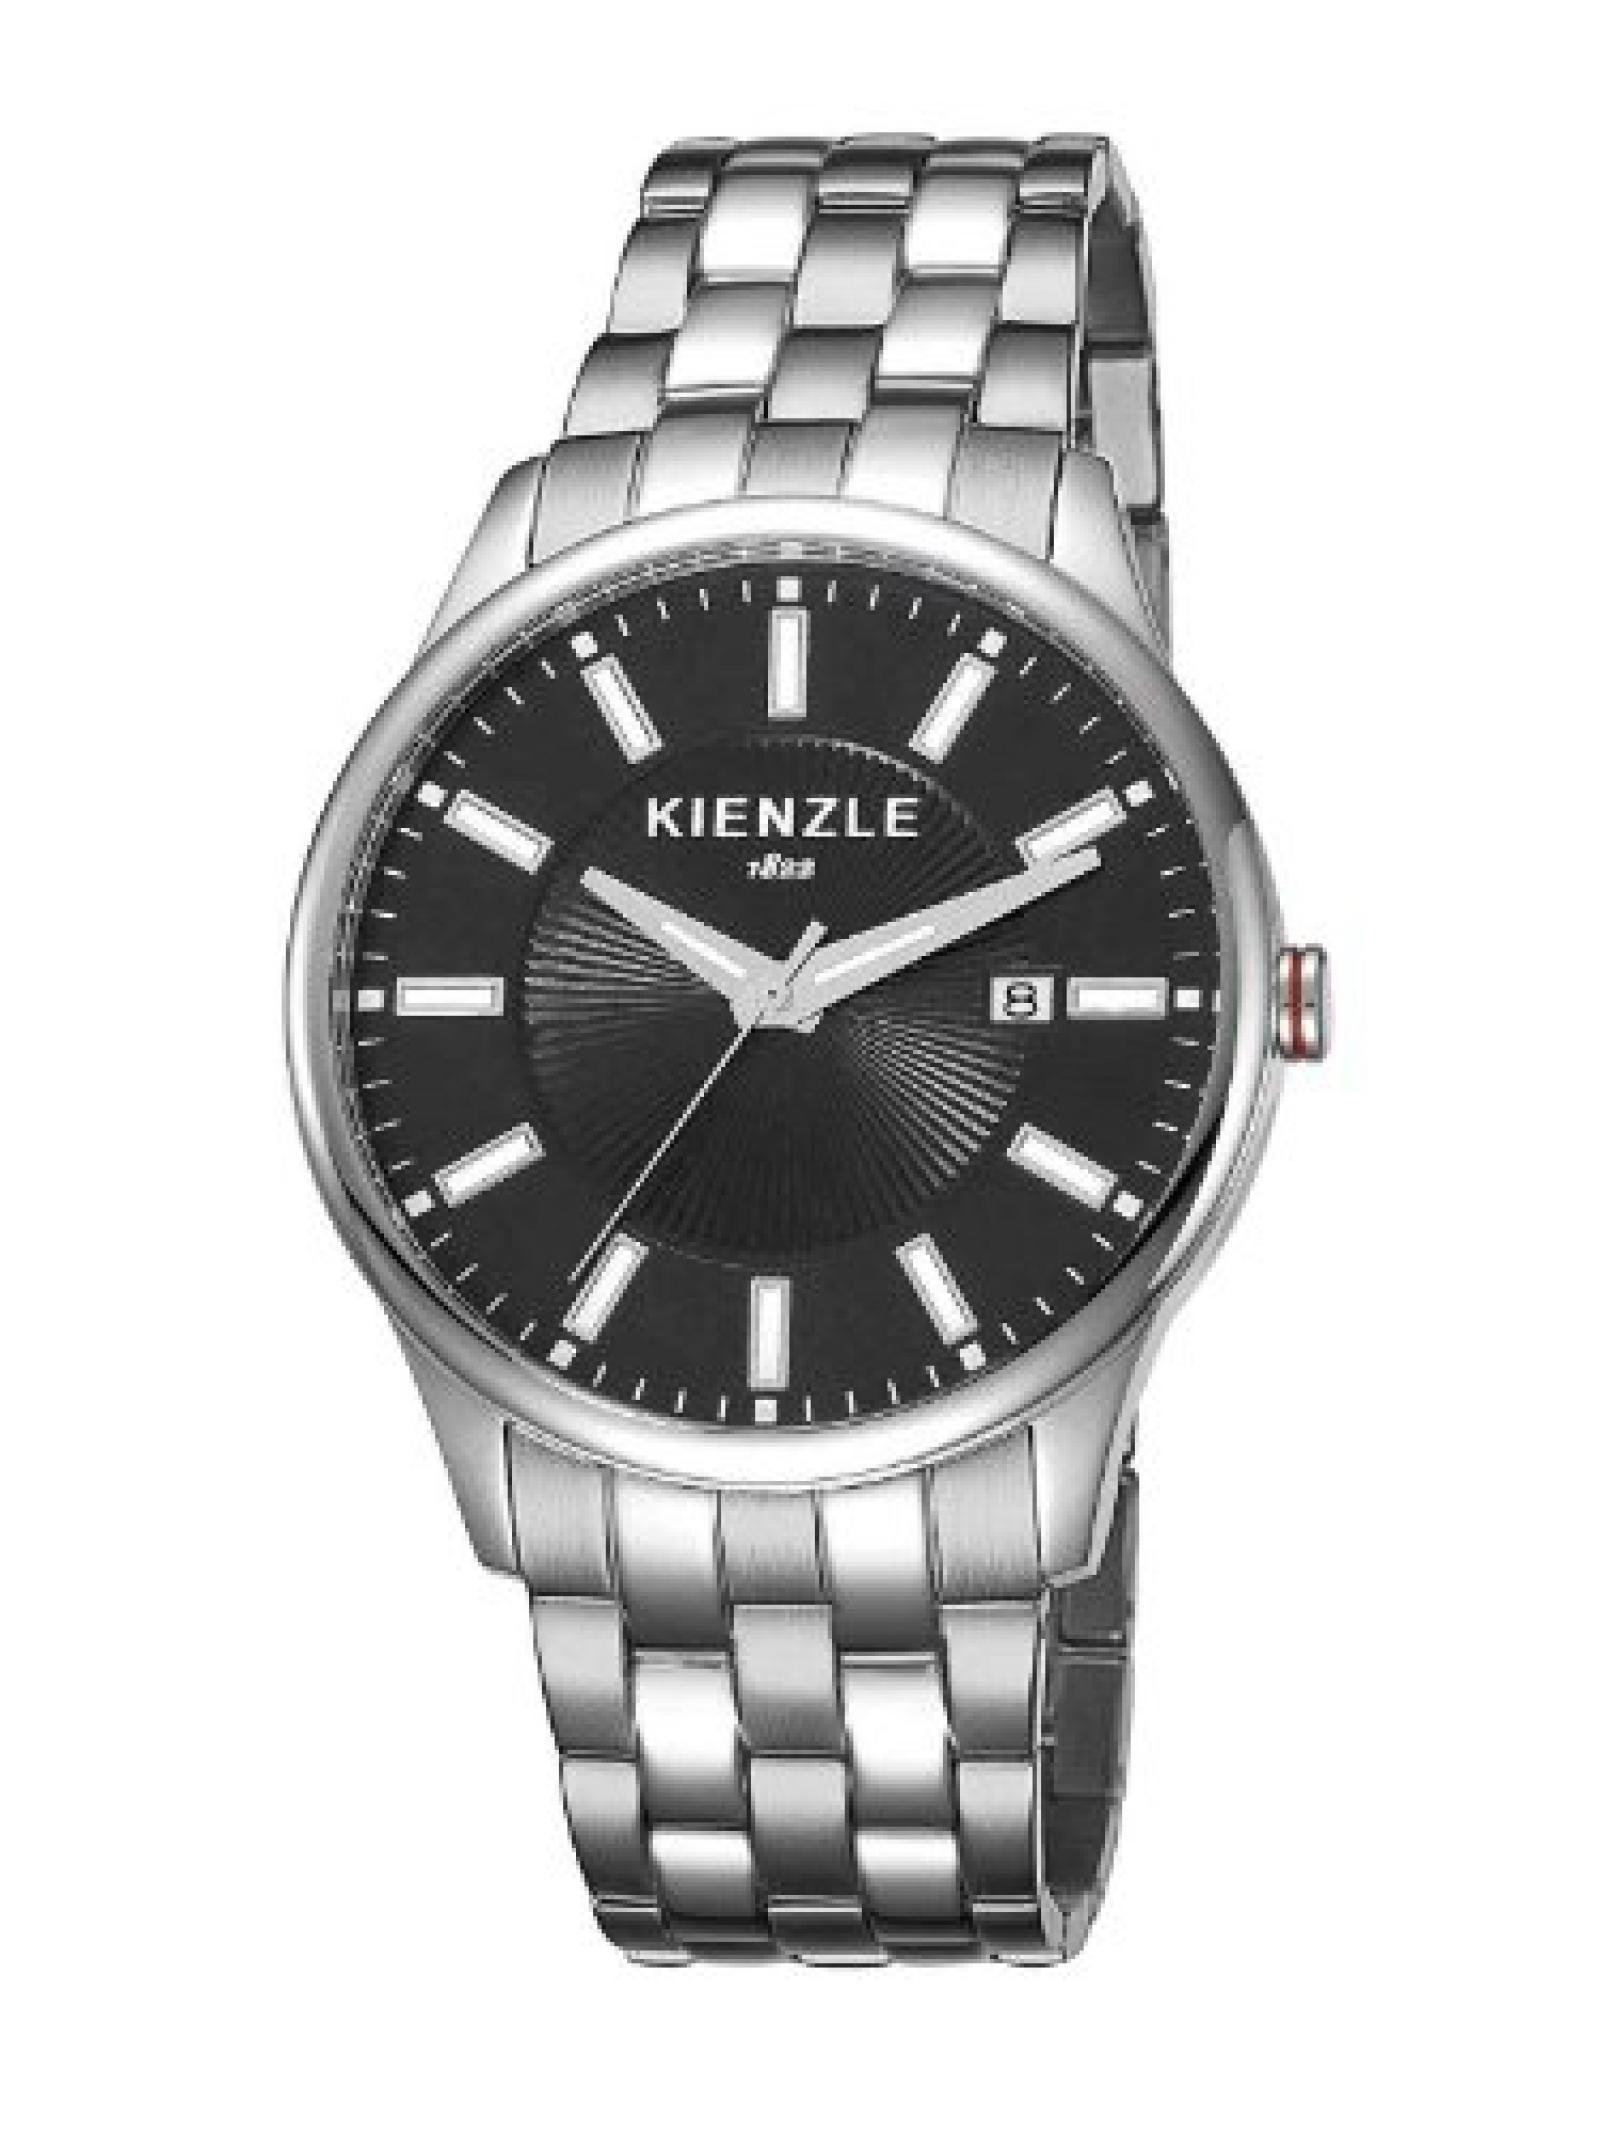 Kienzle Herren-Armbanduhr XL Analog Edelstahl K3041013052